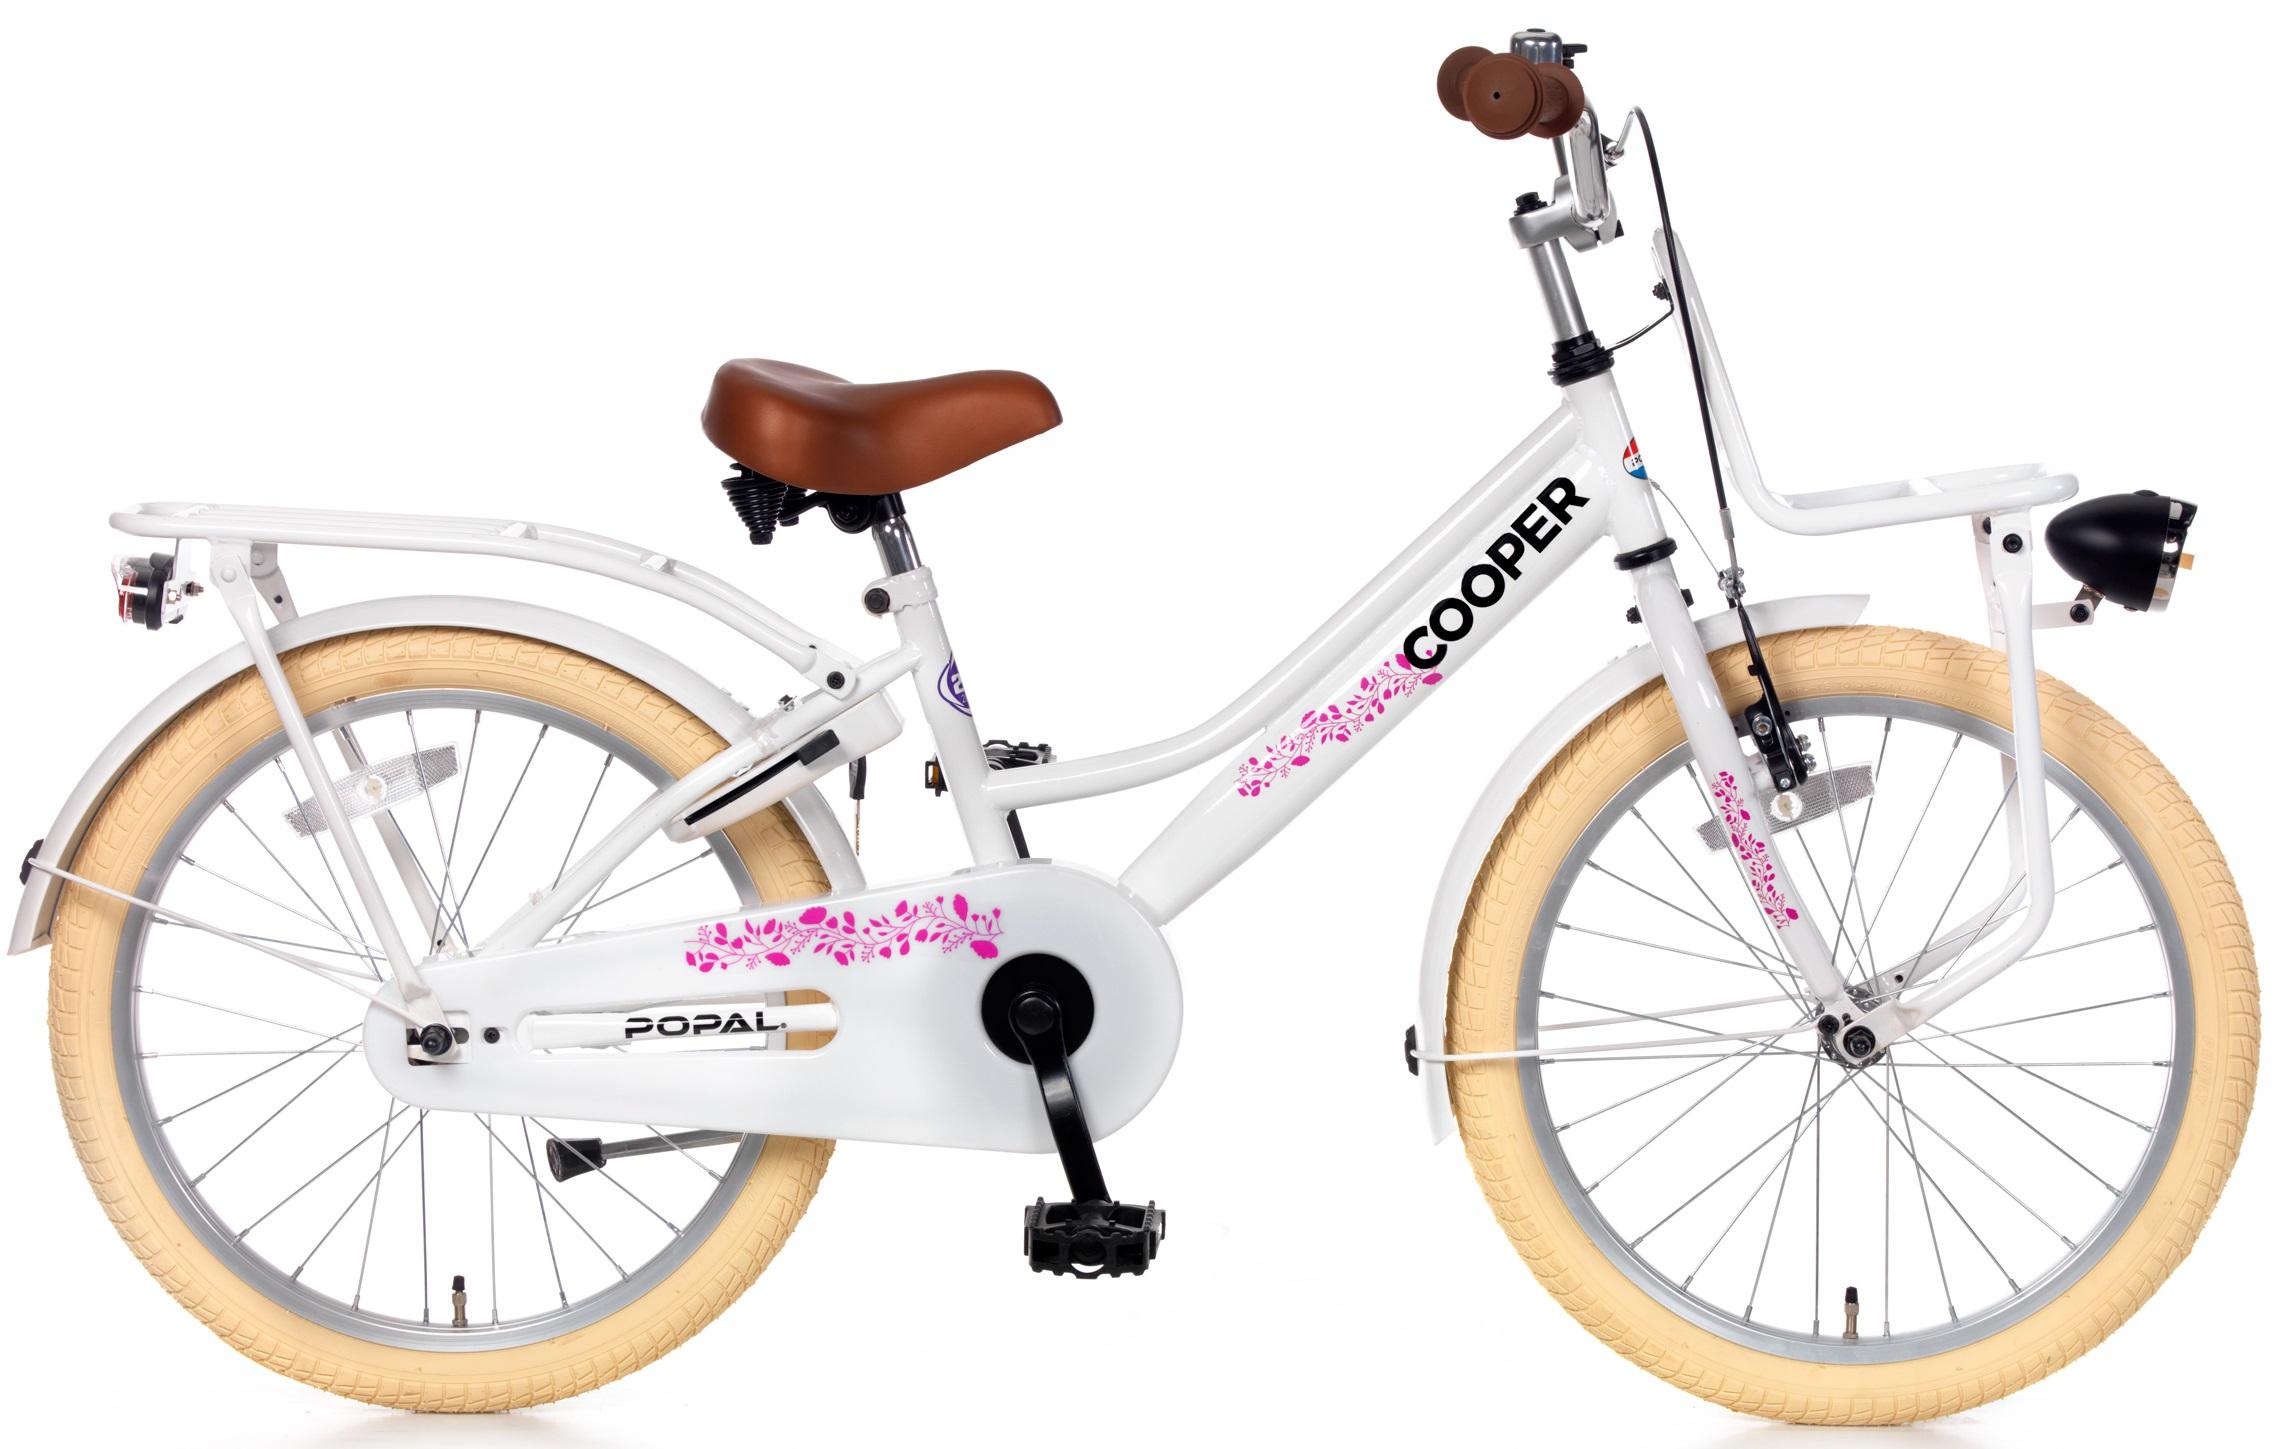 20 zoll m dchen fahrrad popal cooper 2053 ohne schaltung. Black Bedroom Furniture Sets. Home Design Ideas